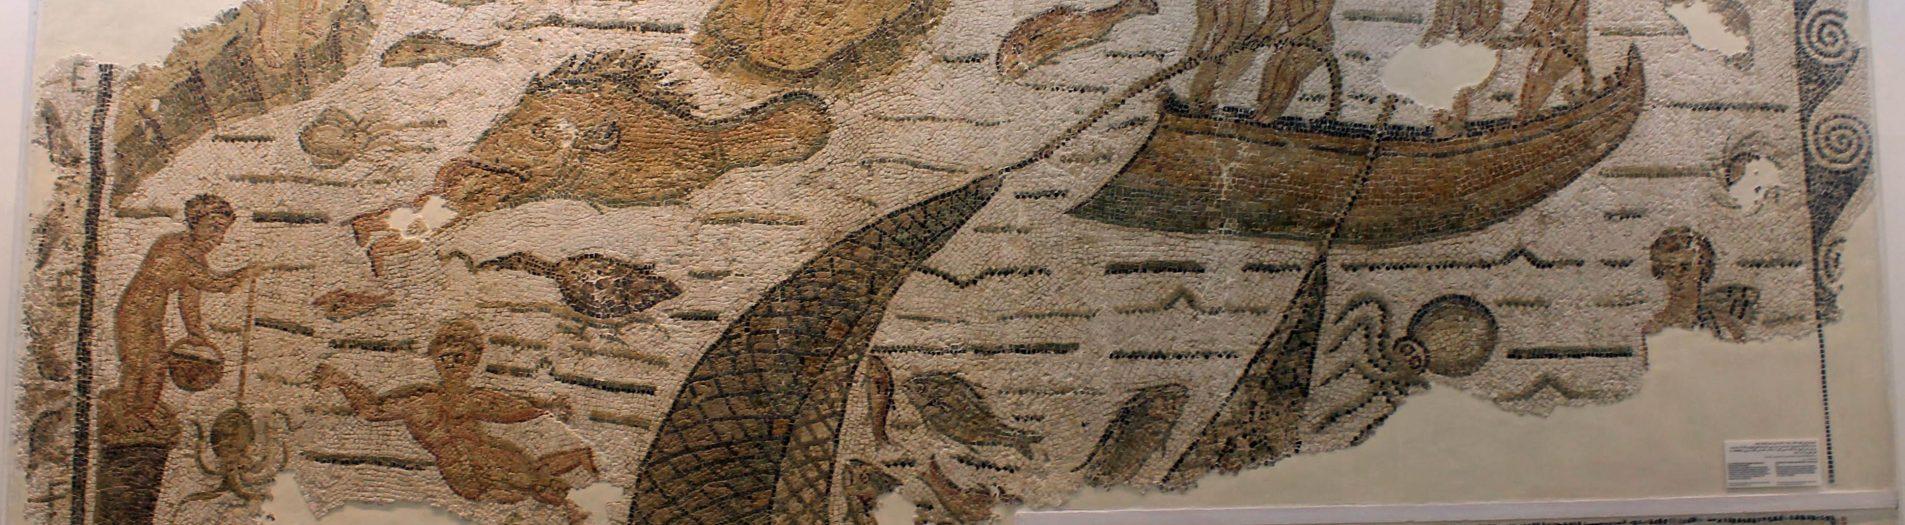 Les mosaïques de Fundus Bassianus (Menzel Bourguiba)